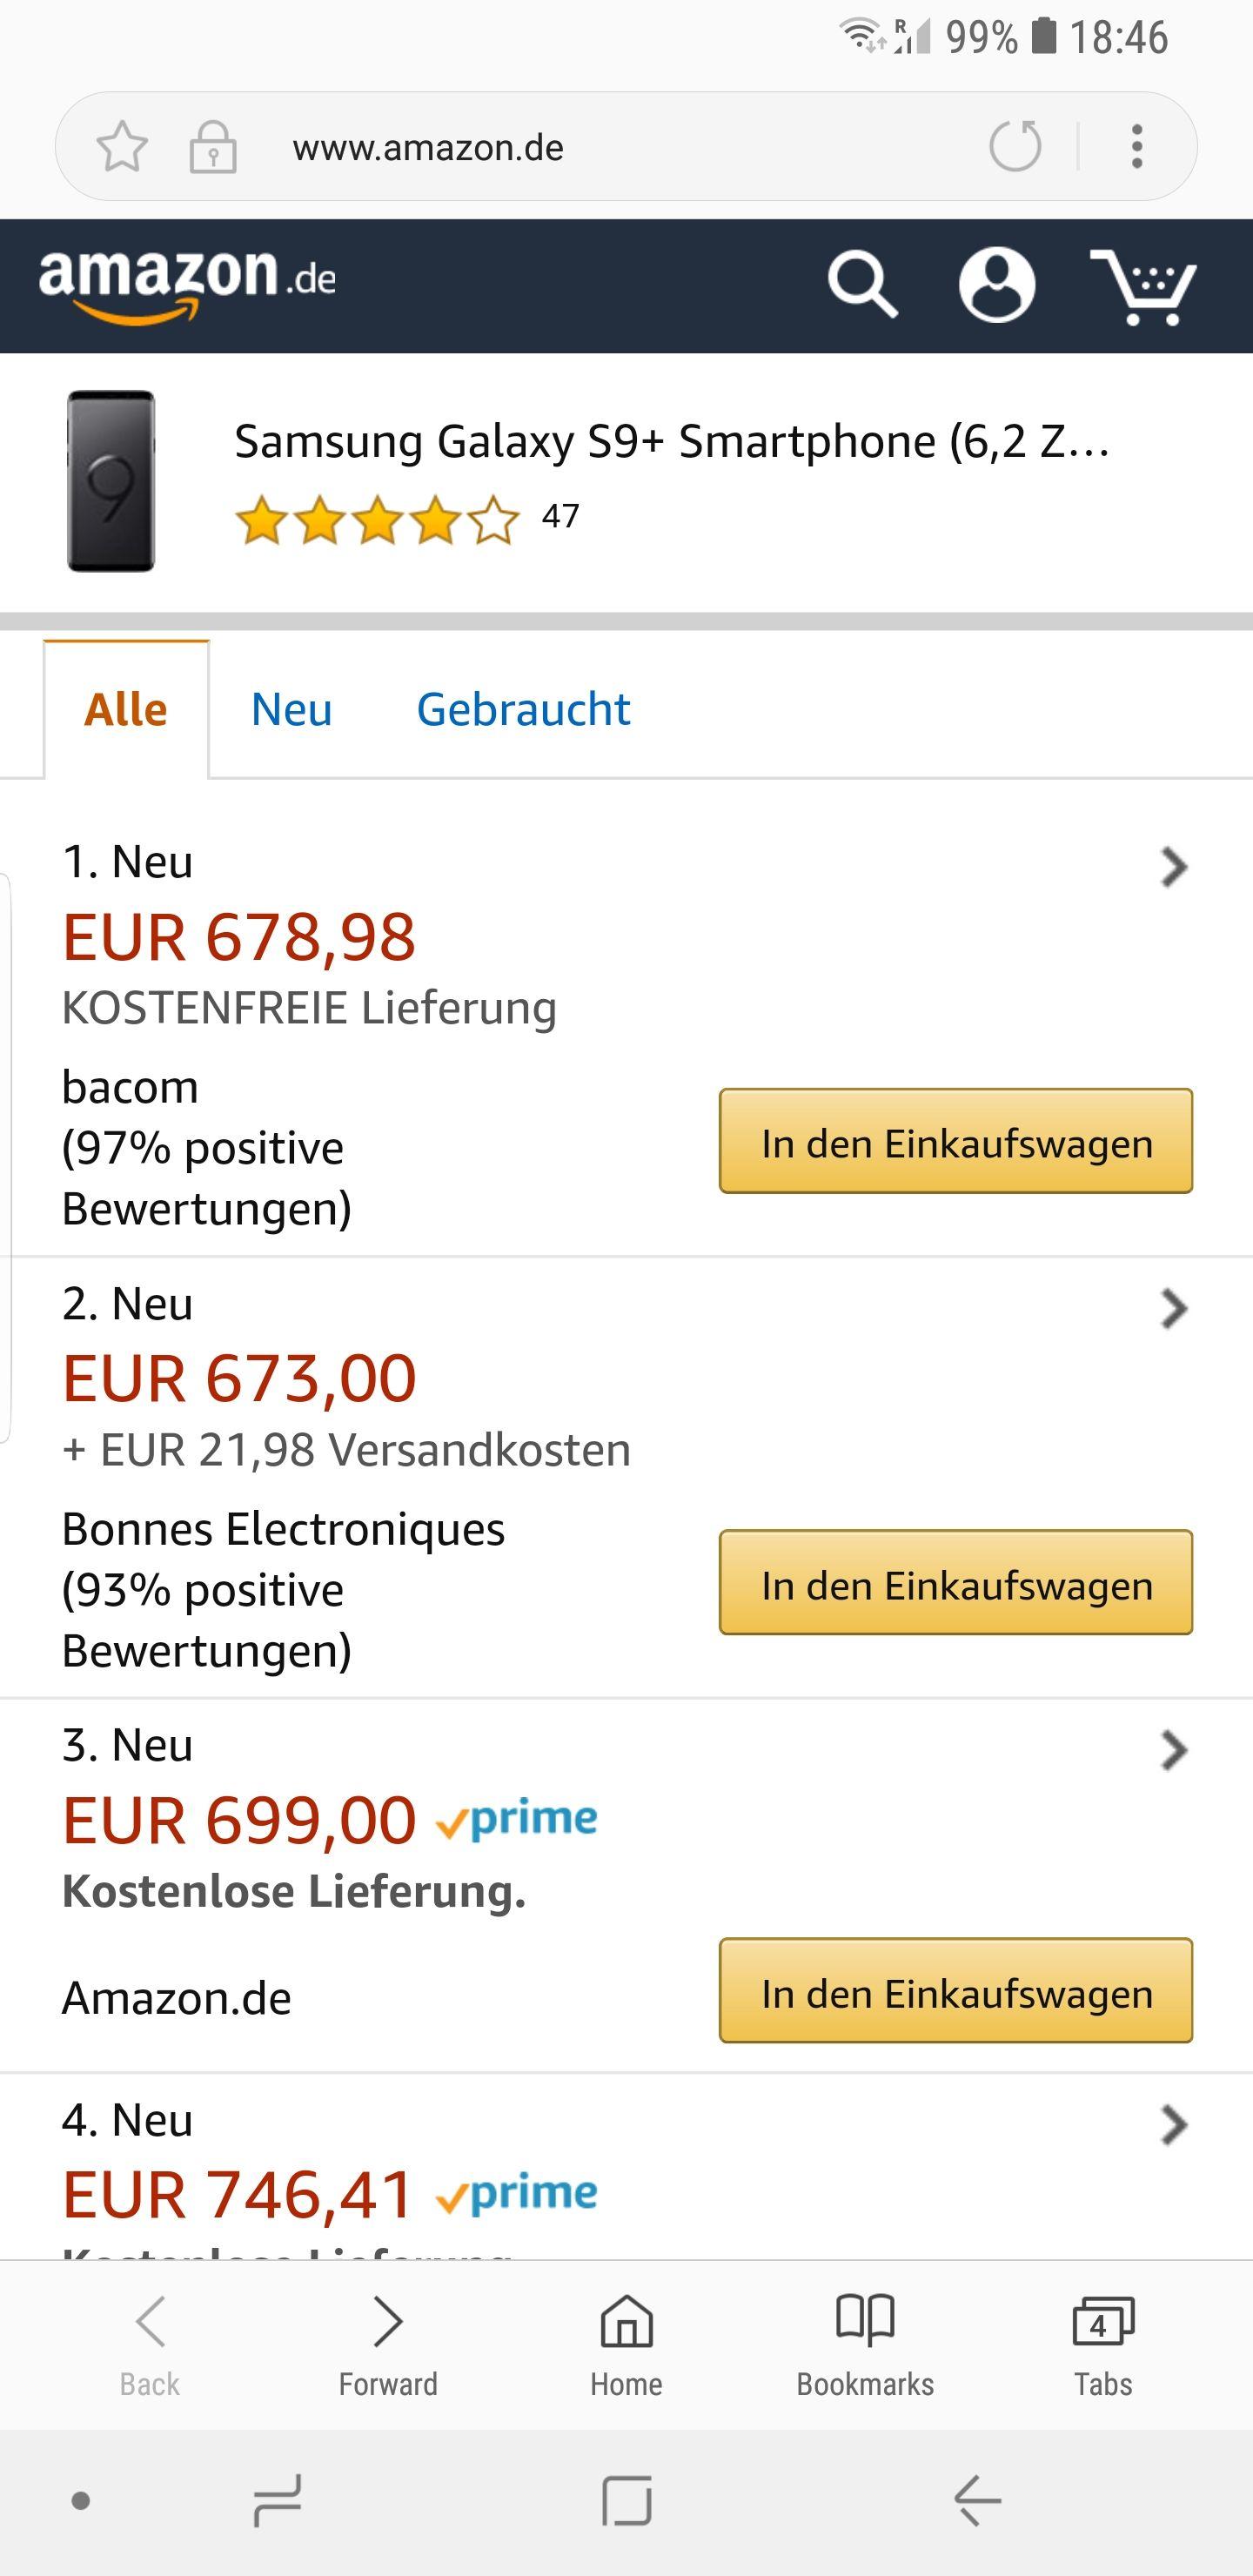 Samsung galaxy S9 plus, dual sim, 64GB at Amazon Germany for £614